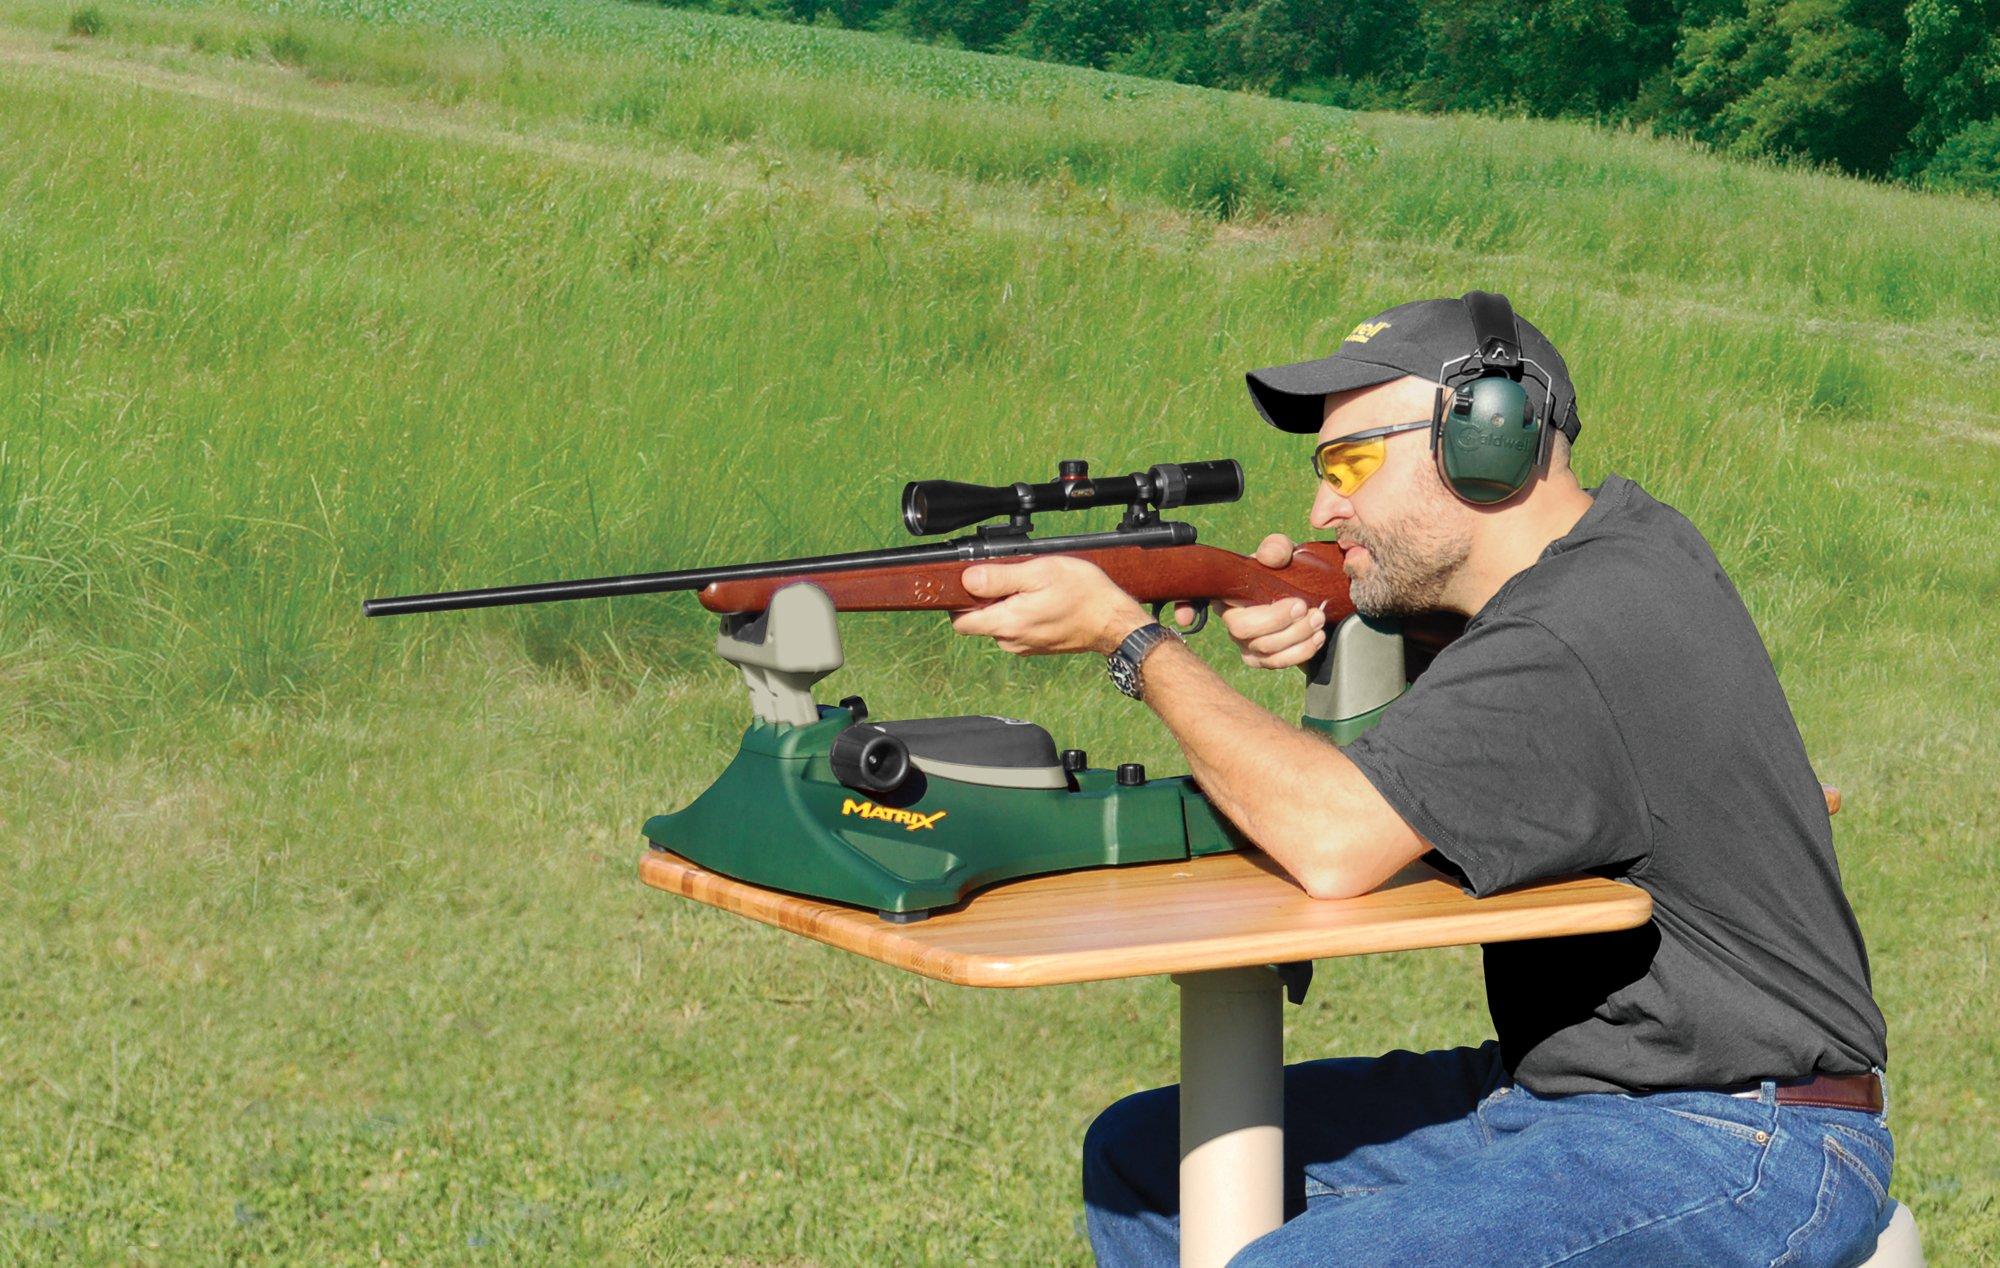 Caldwell Matrix Adjustable Ambidextrous Rifle Pistol Handgun Shooting Rest for Outdoor Range by Caldwell (Image #6)